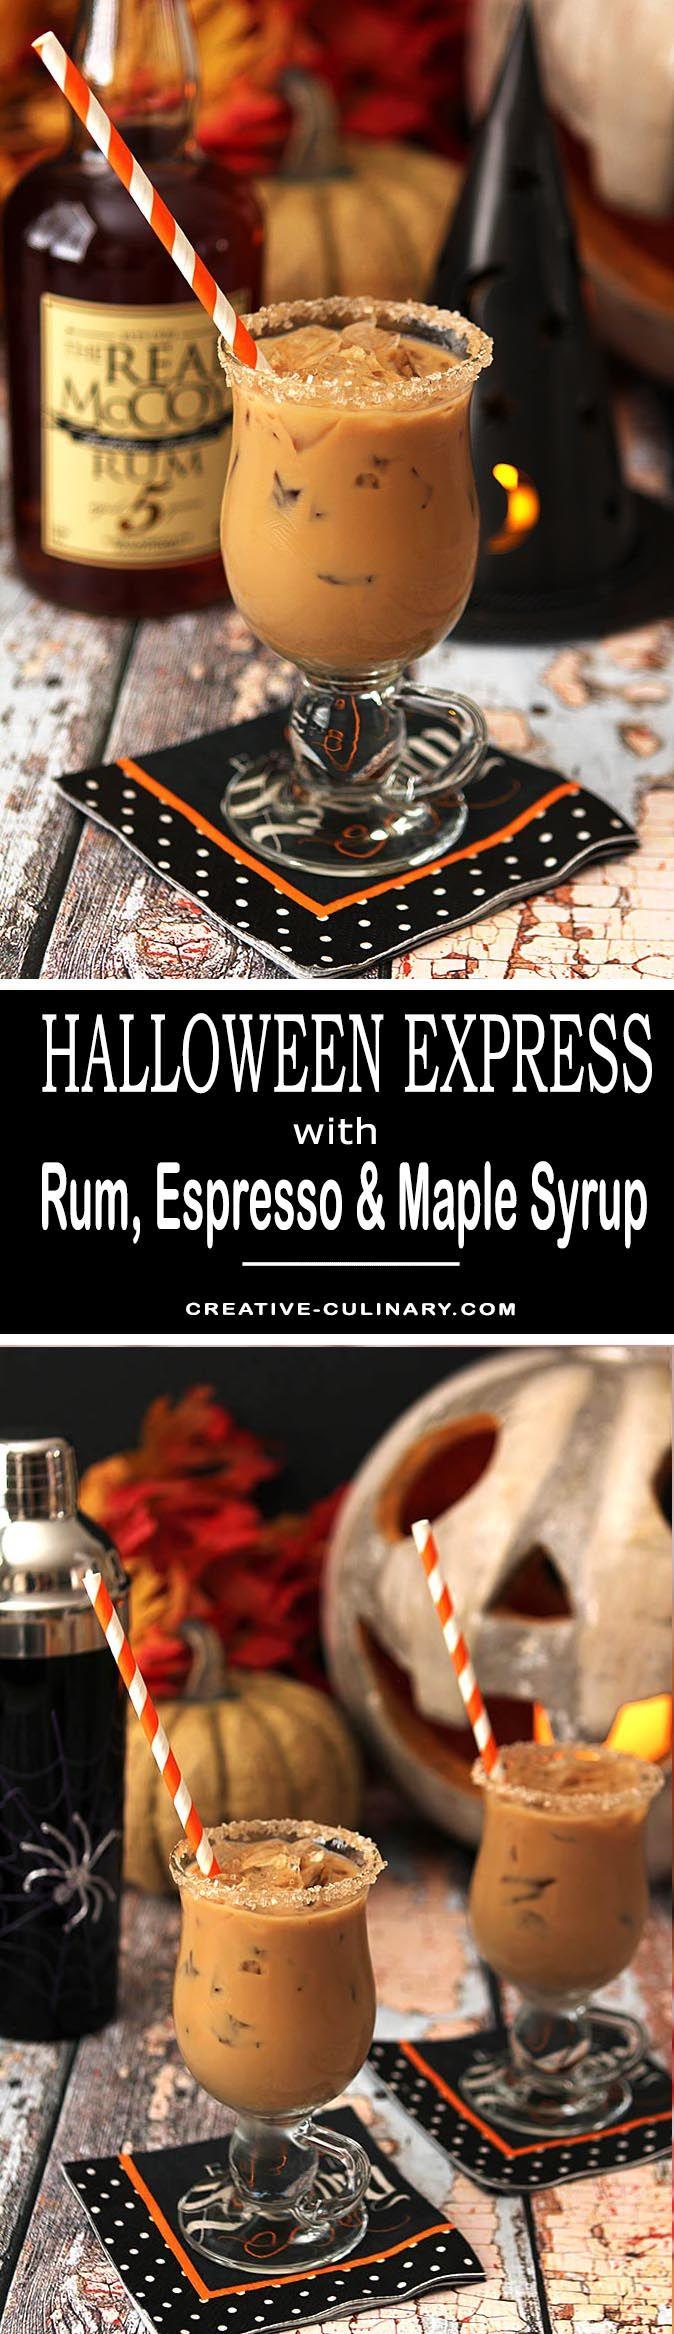 Best 25+ Halloween express ideas on Pinterest | Ingredients for ...